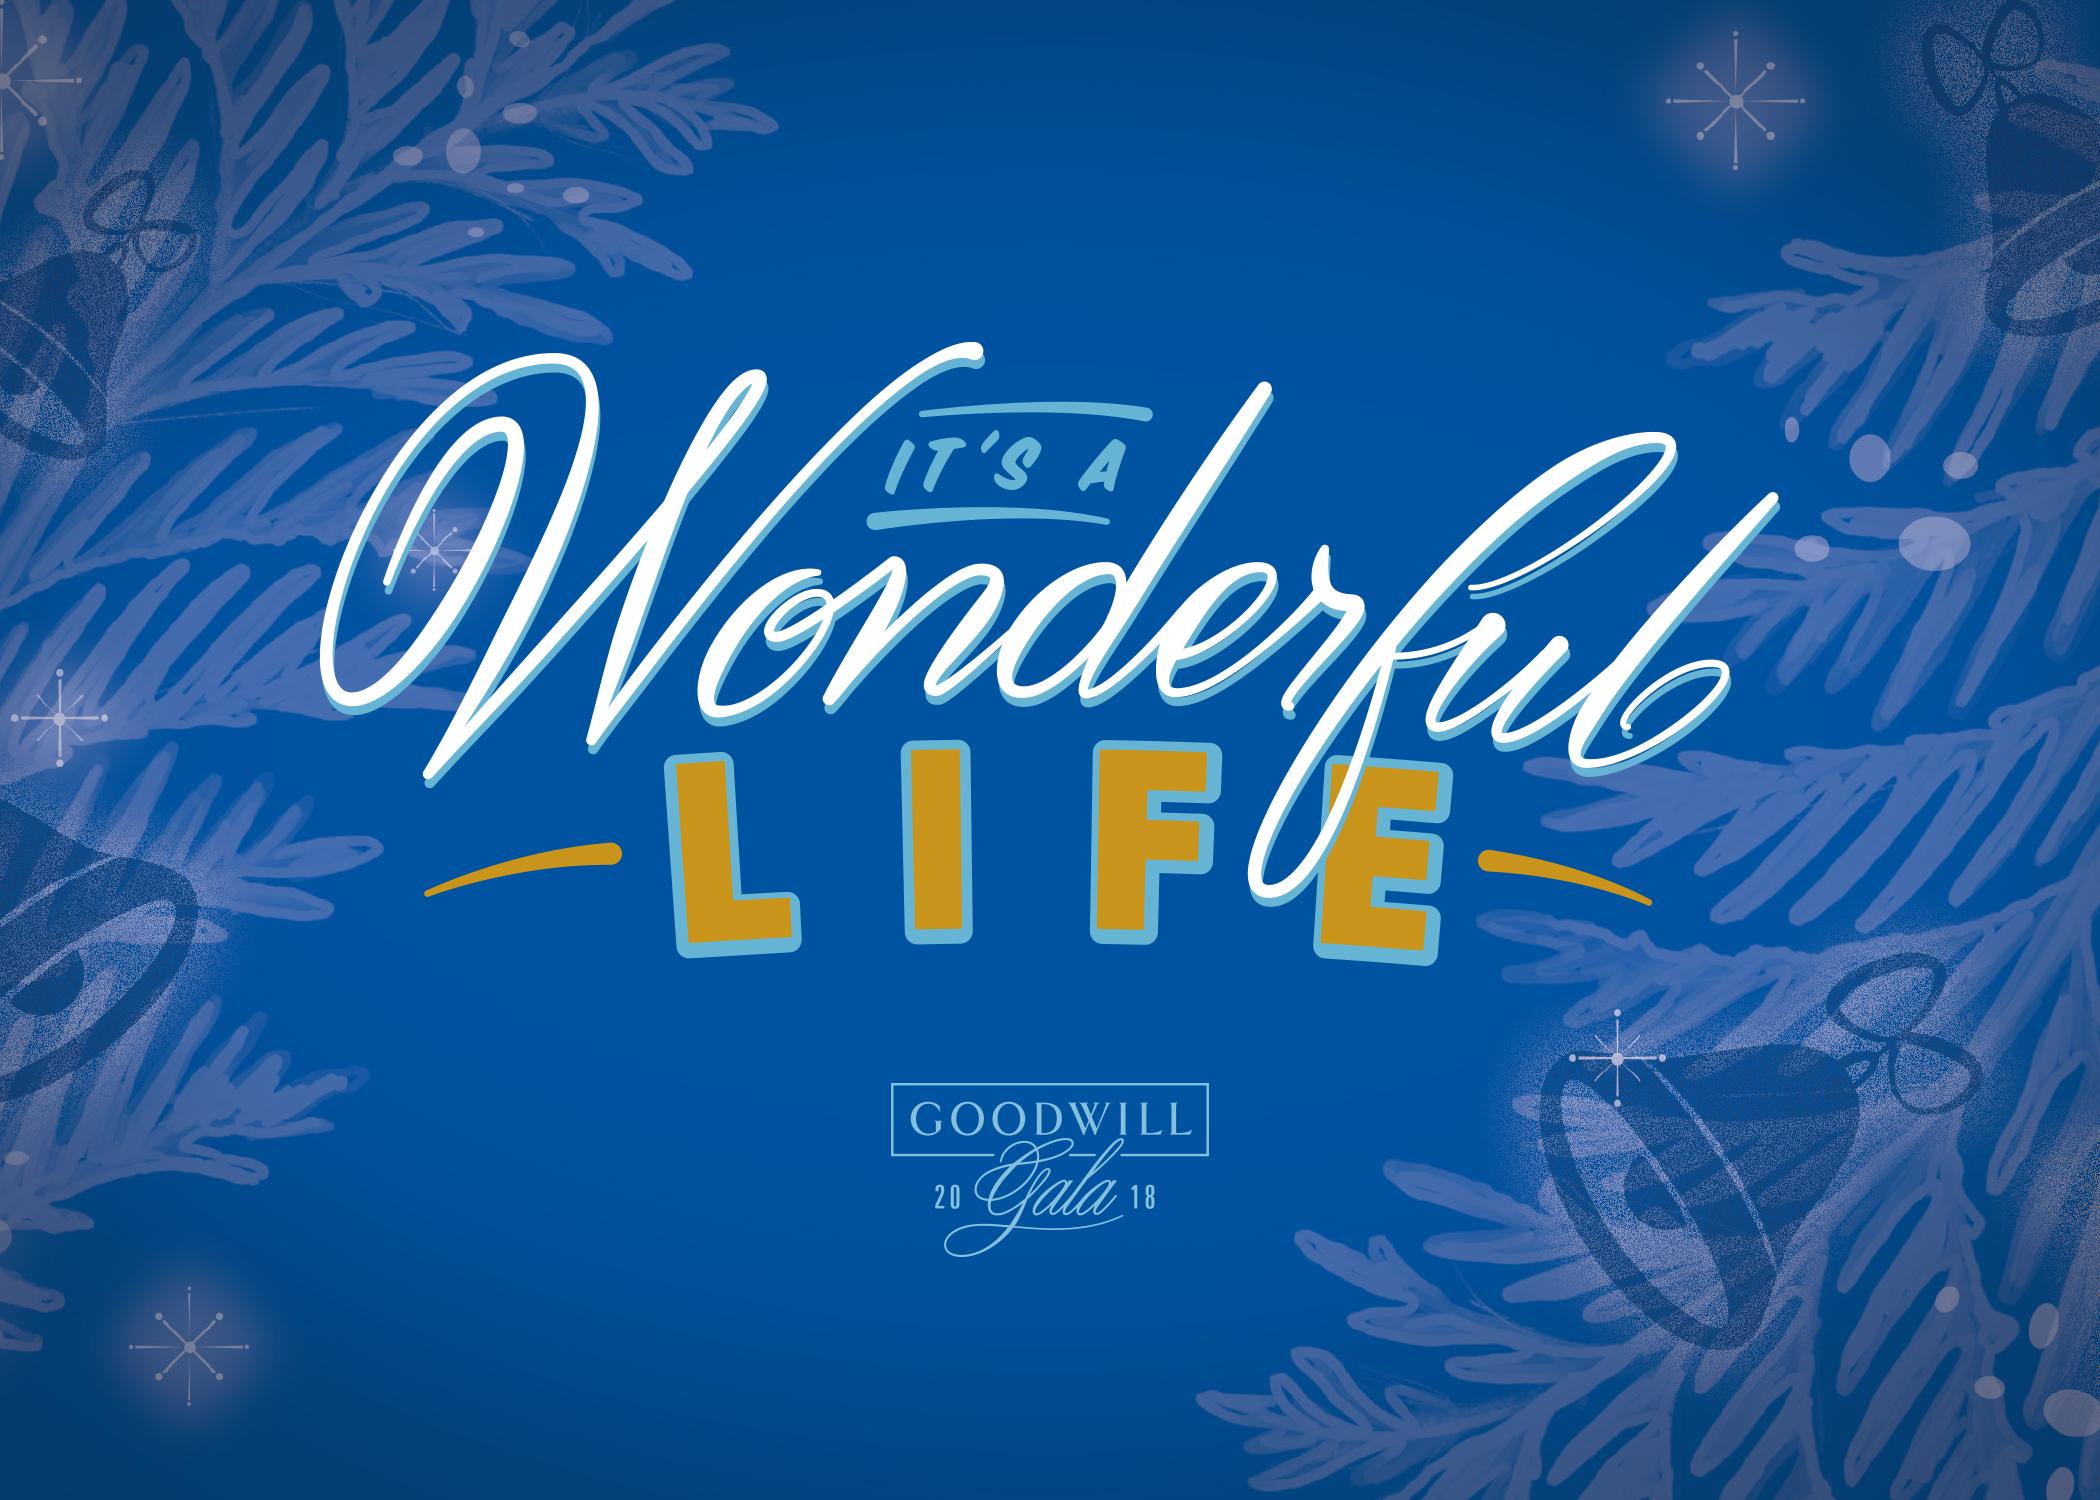 GW_WonderfulLife_Invite.jpg